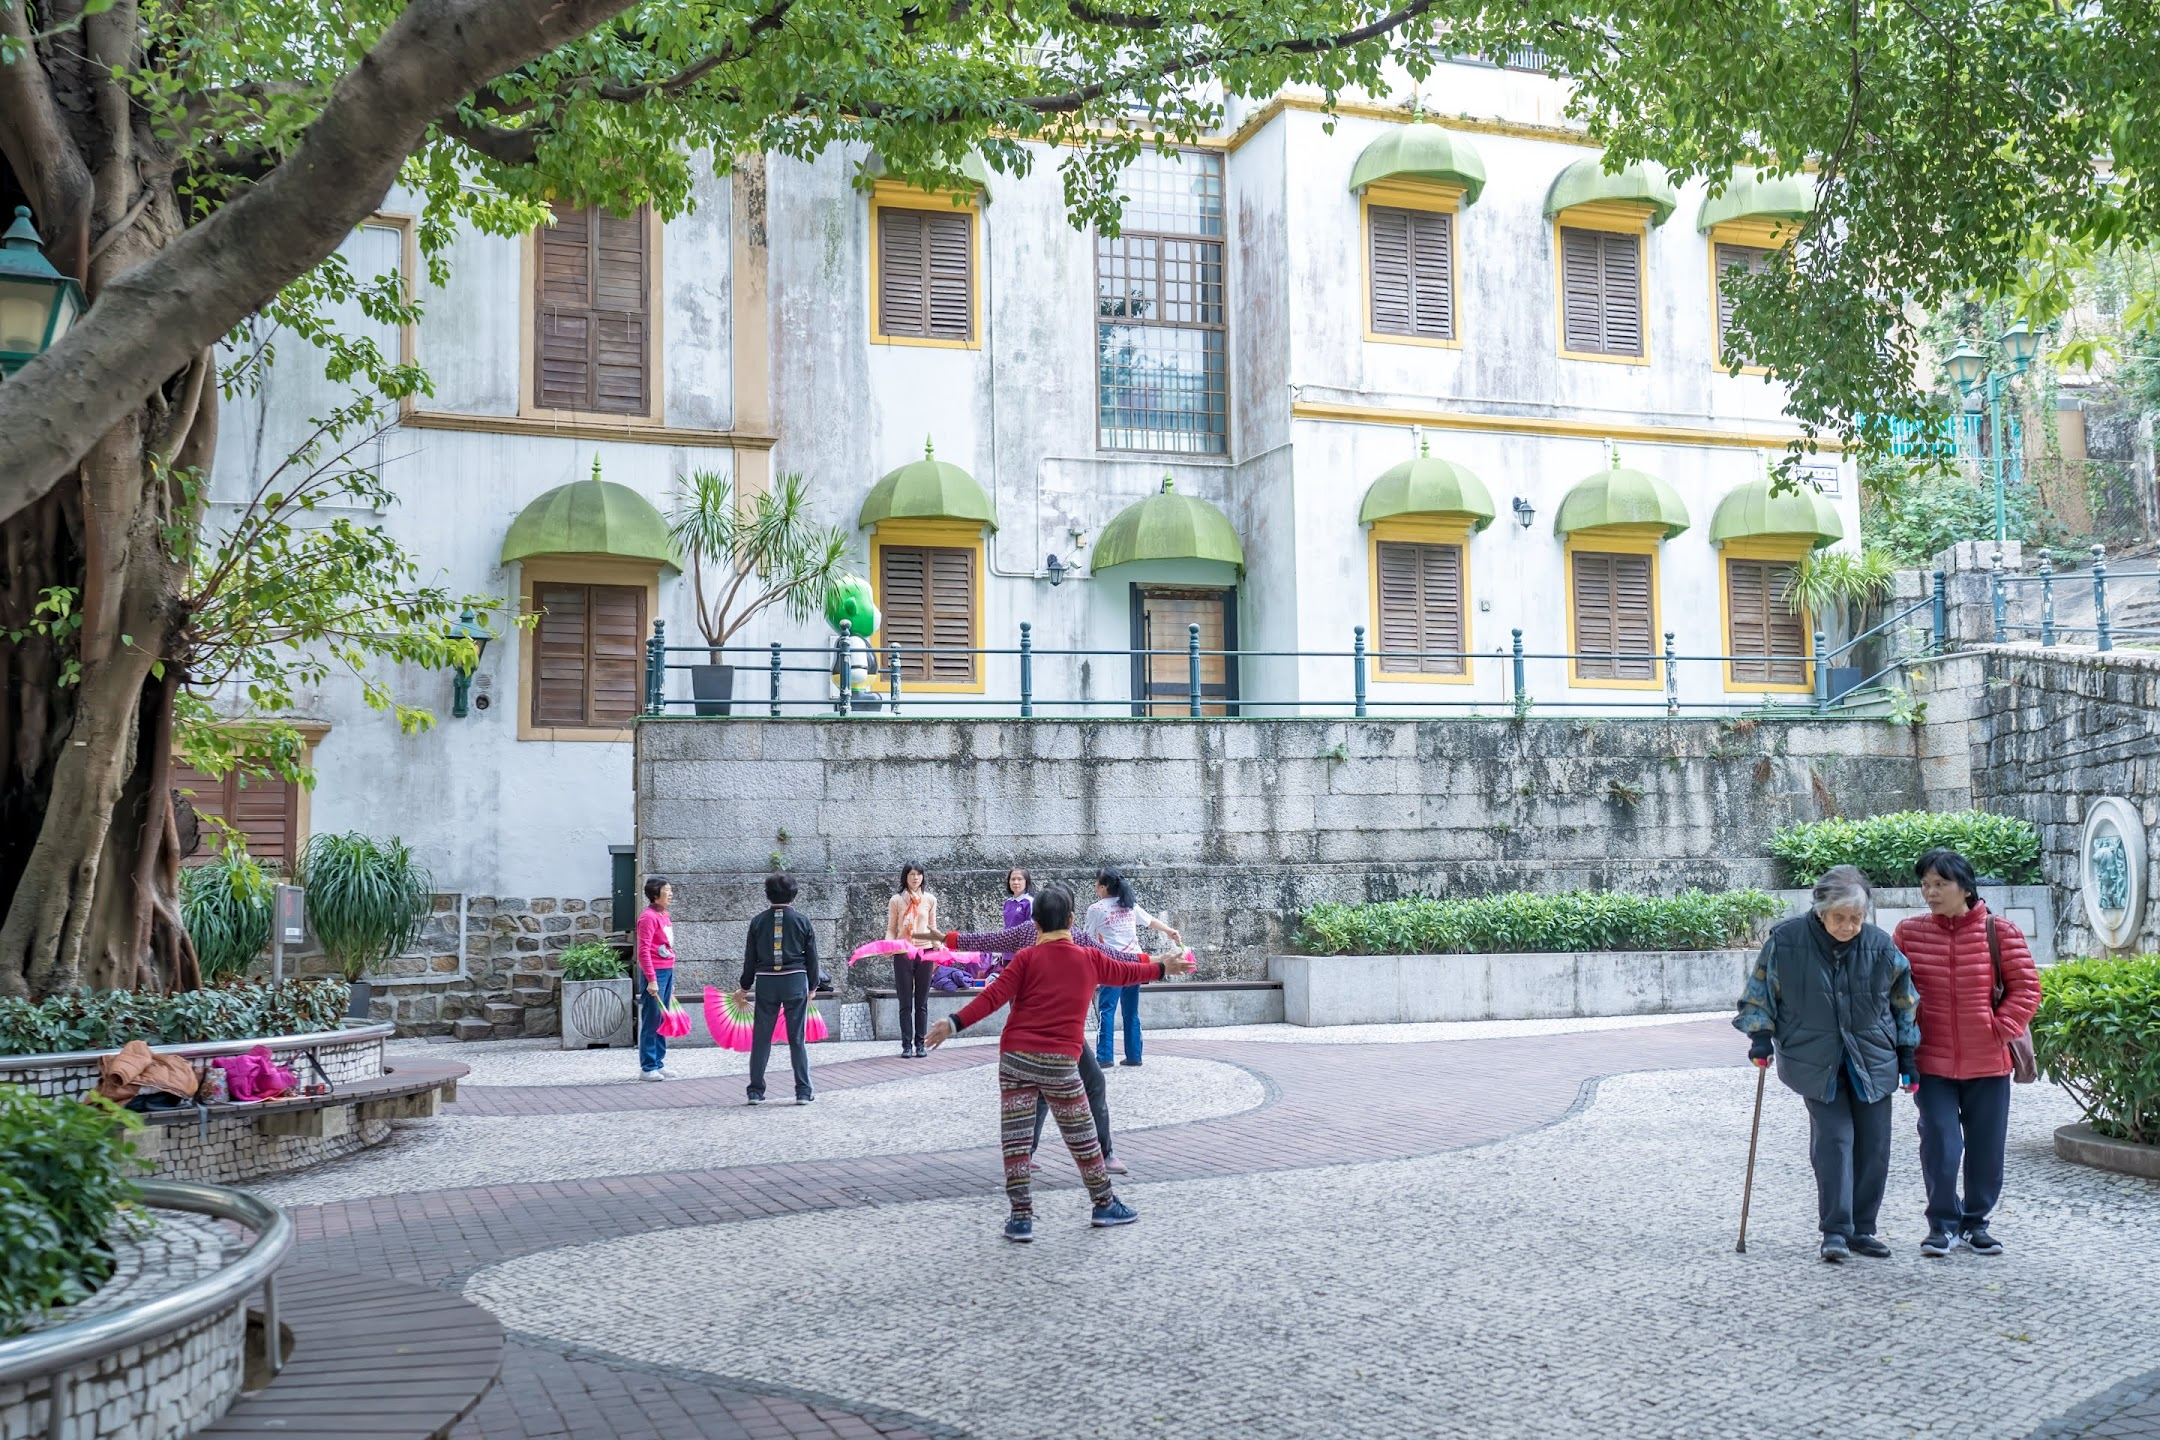 Macau Lilau Square/亞婆井前地/Largodo Lilau